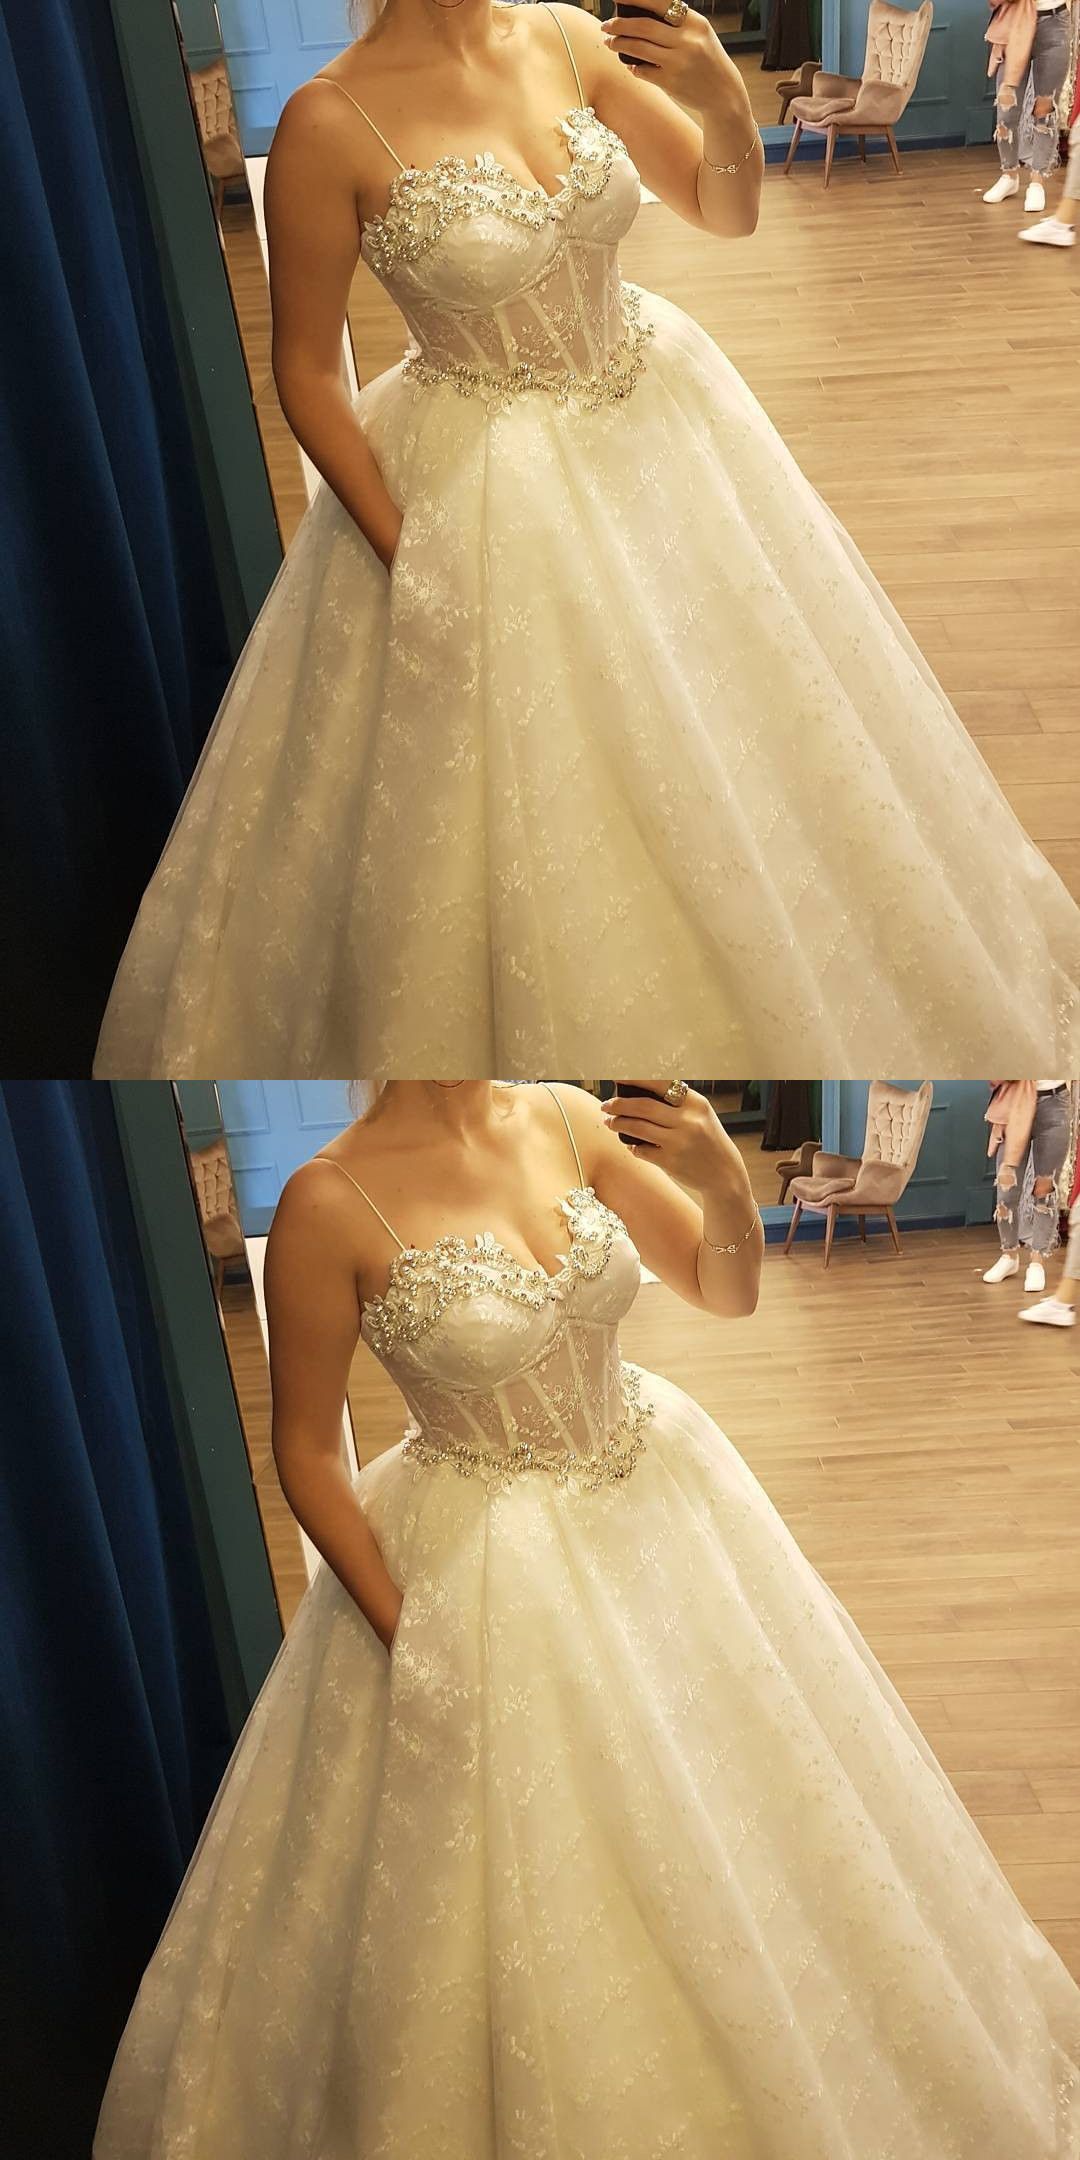 Sheer Corset Beaded Sweetheart Ball Gown Lace Wedding